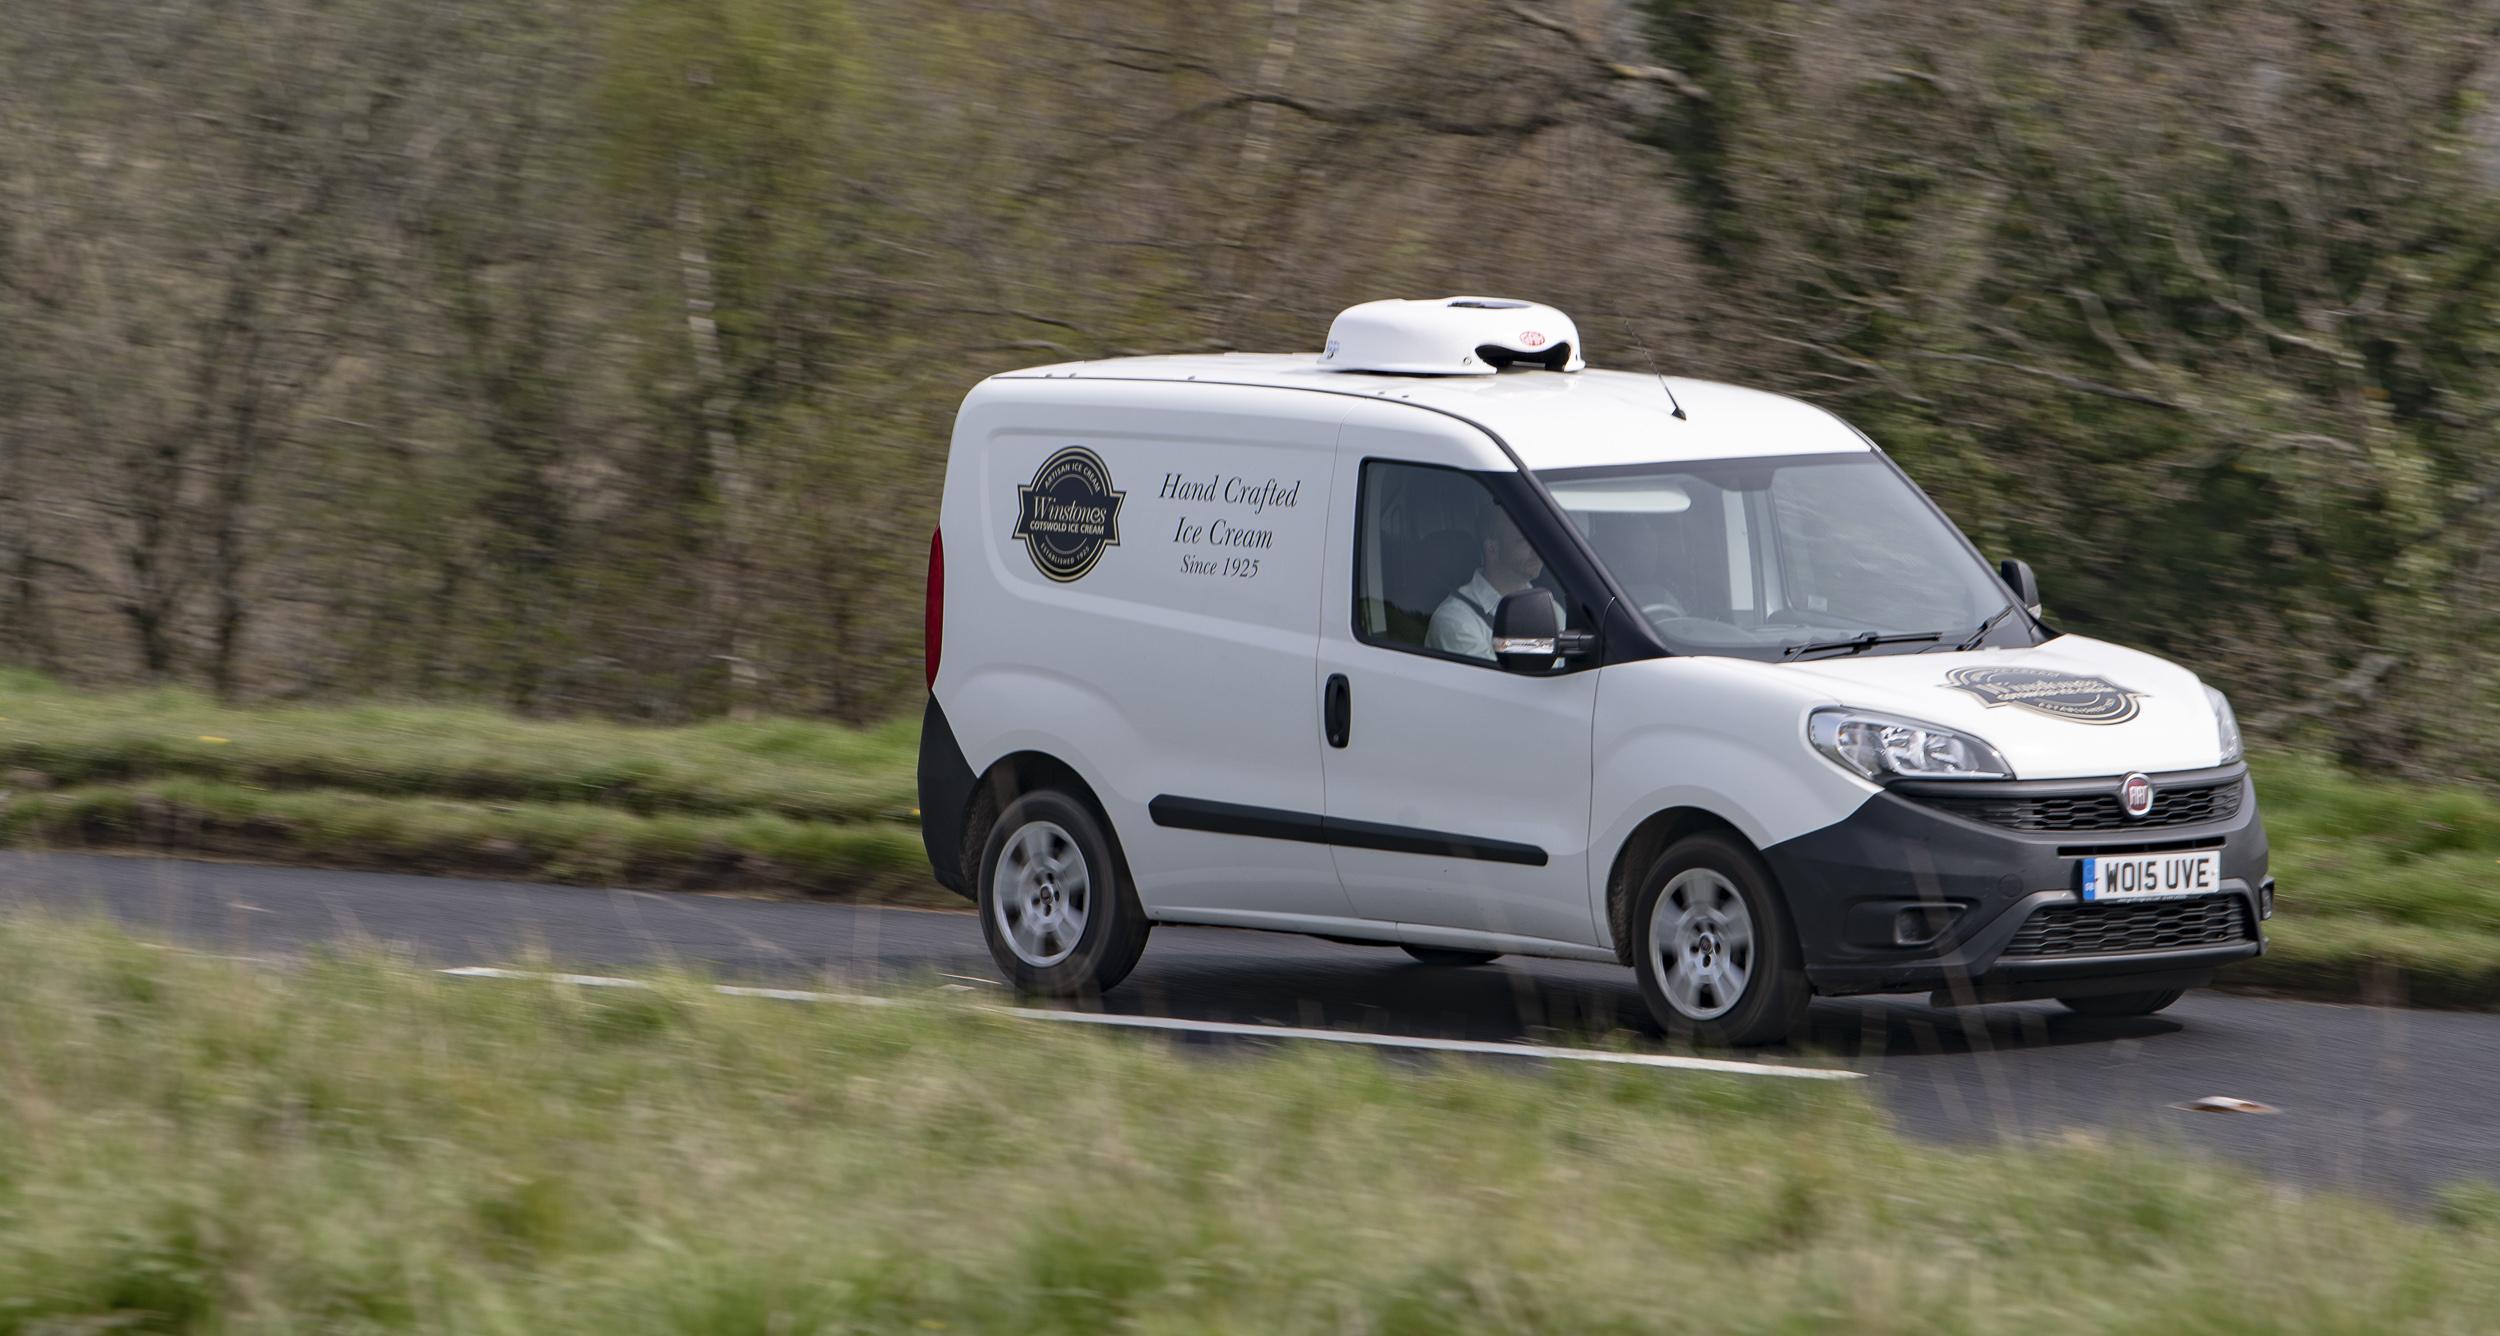 Winstones ice cream delivery van